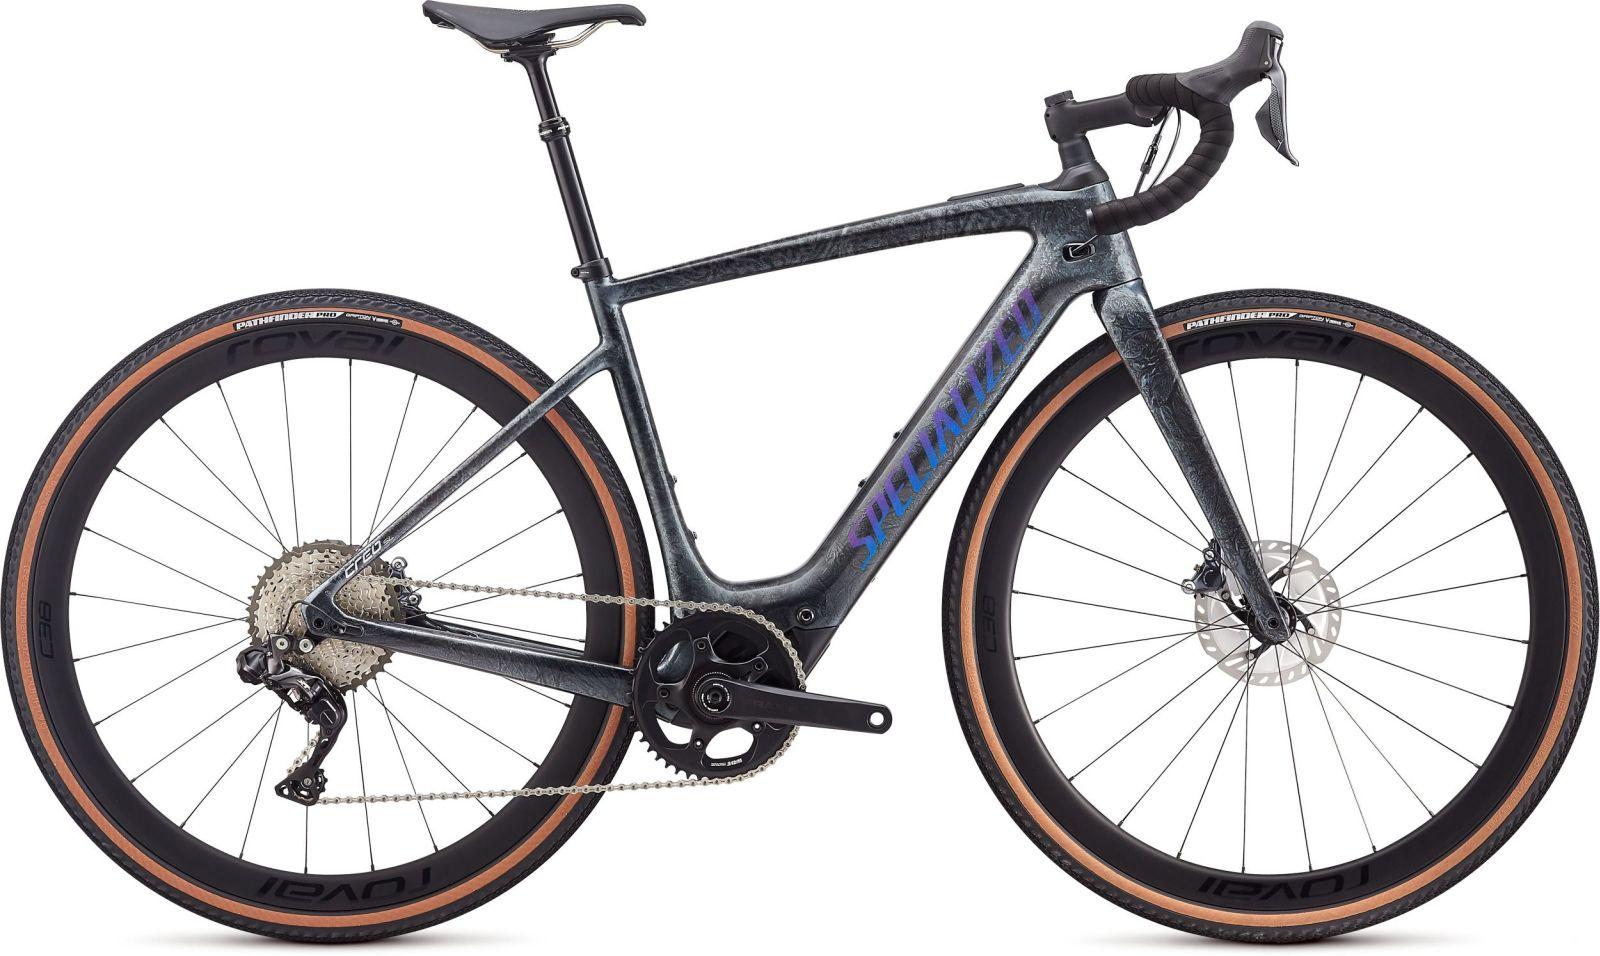 Specialized Turbo Creo SL Expert EVO - black granite/green blue chameleon L